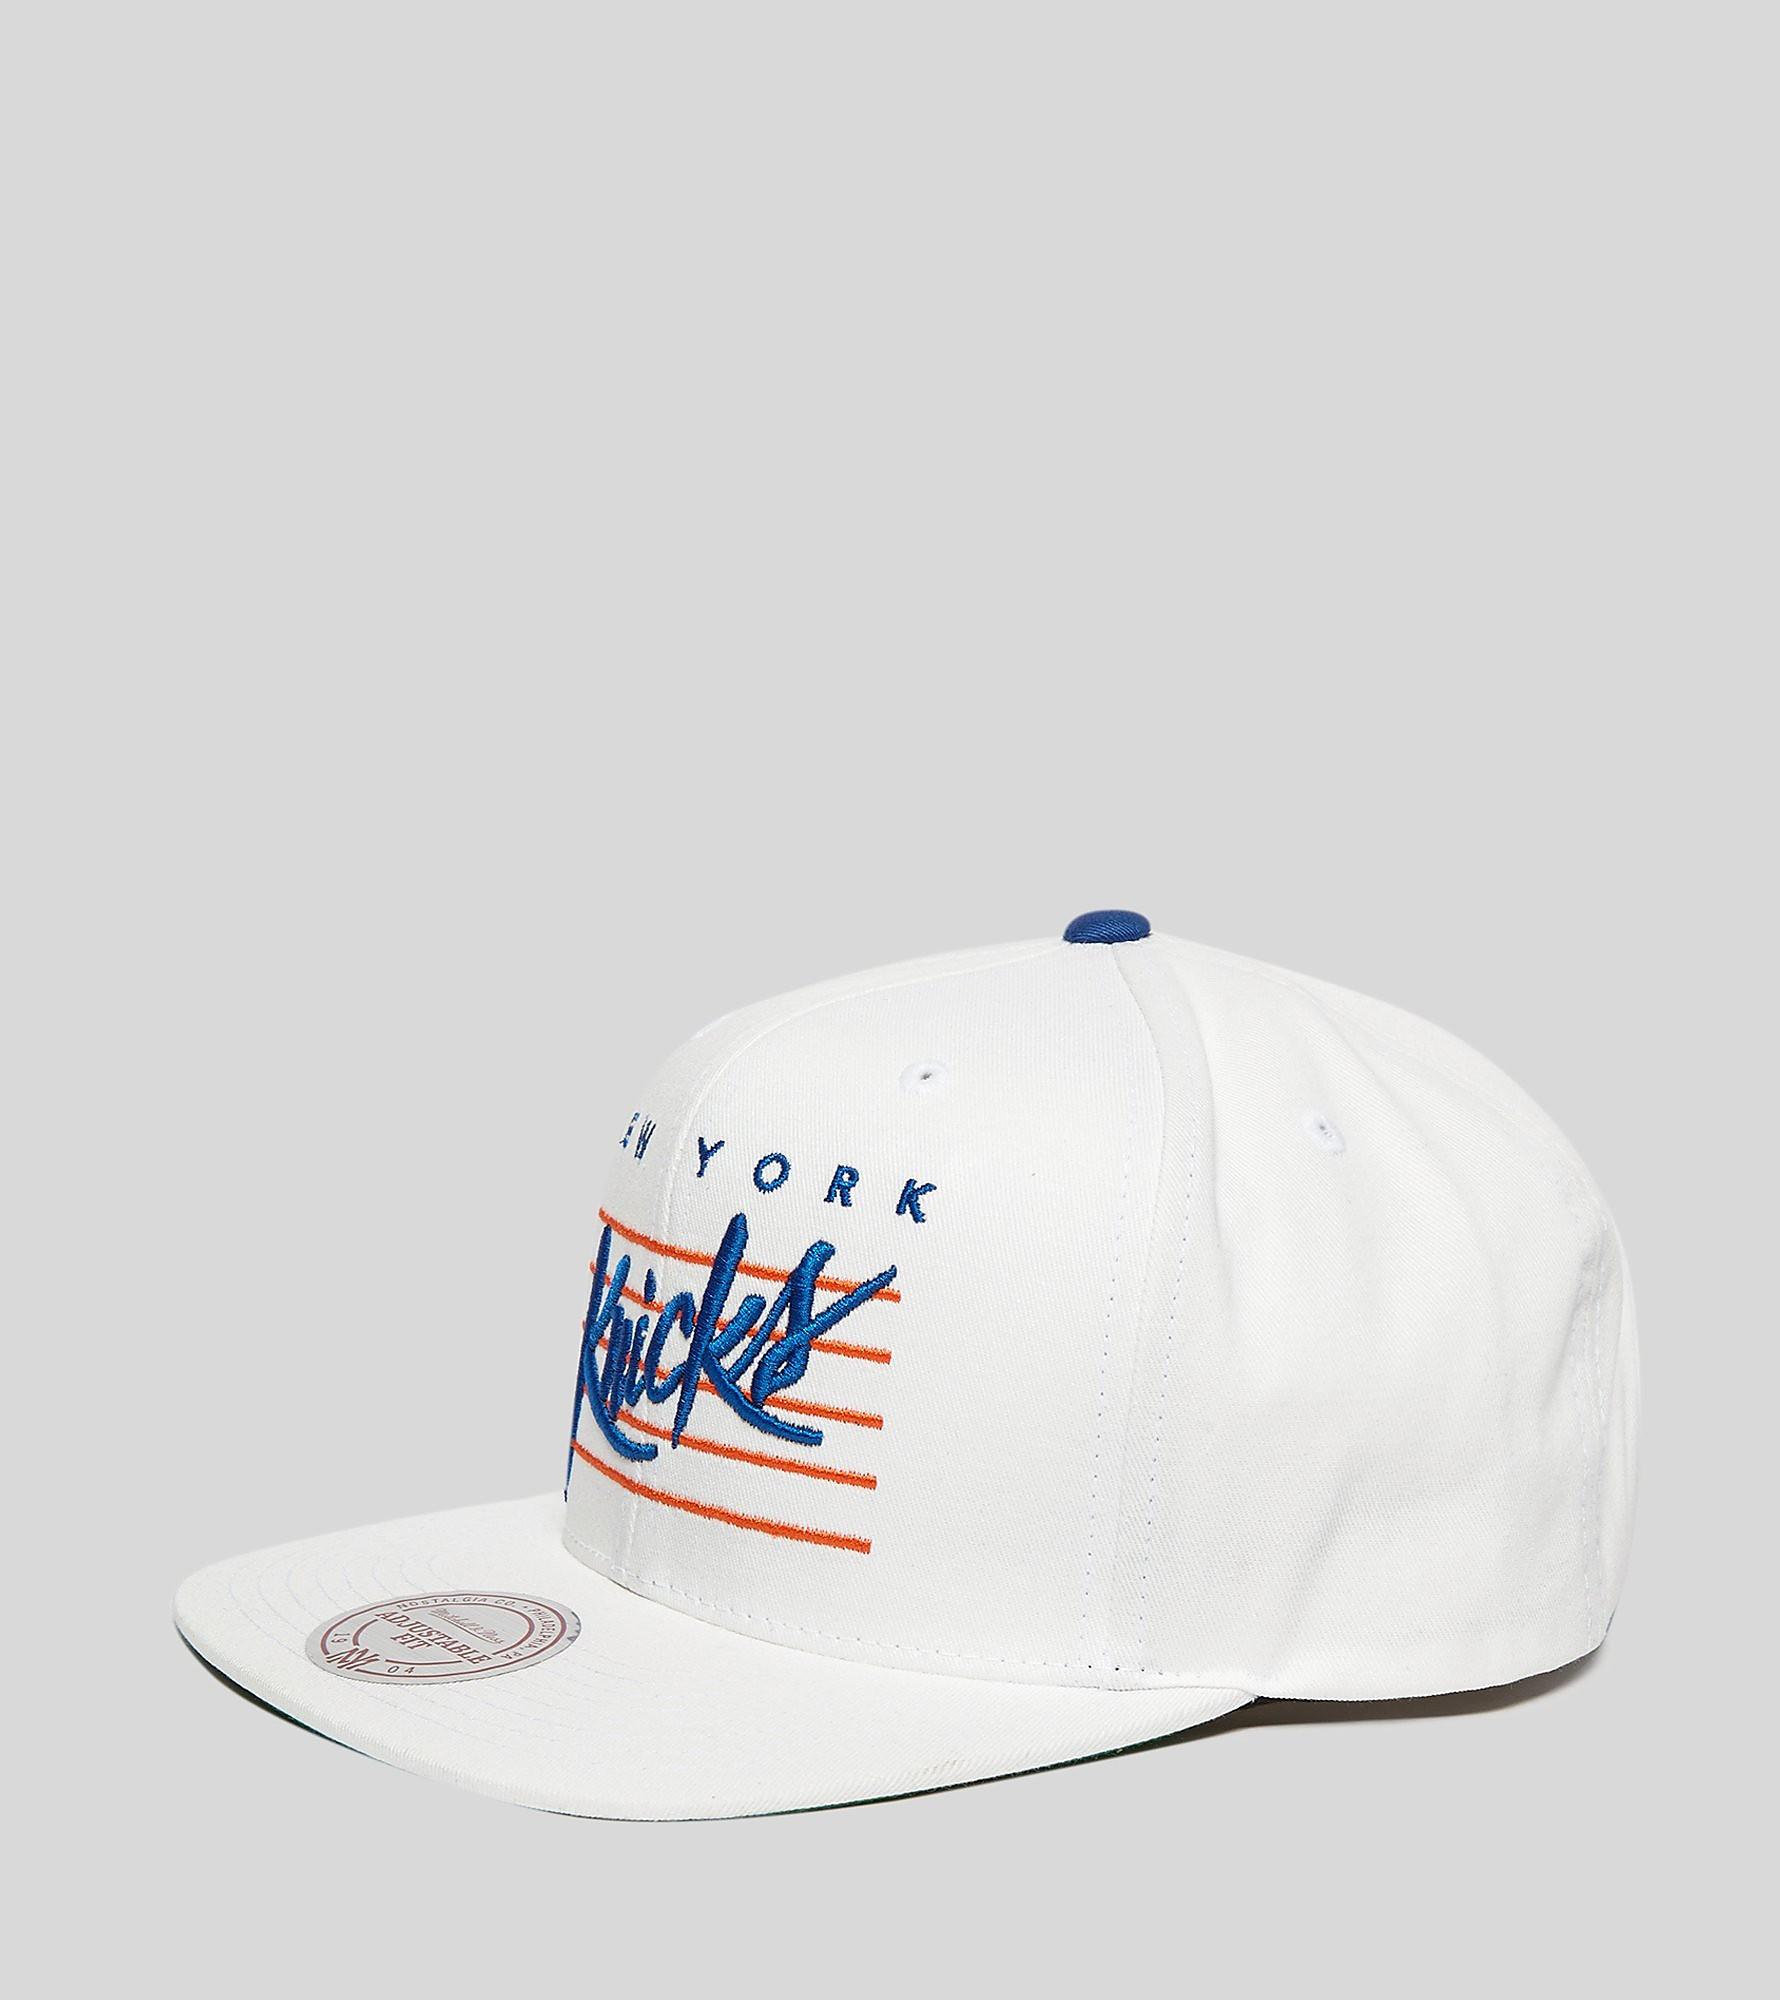 Mitchell & Ness Cursive Script New York Knicks Snapback Cap